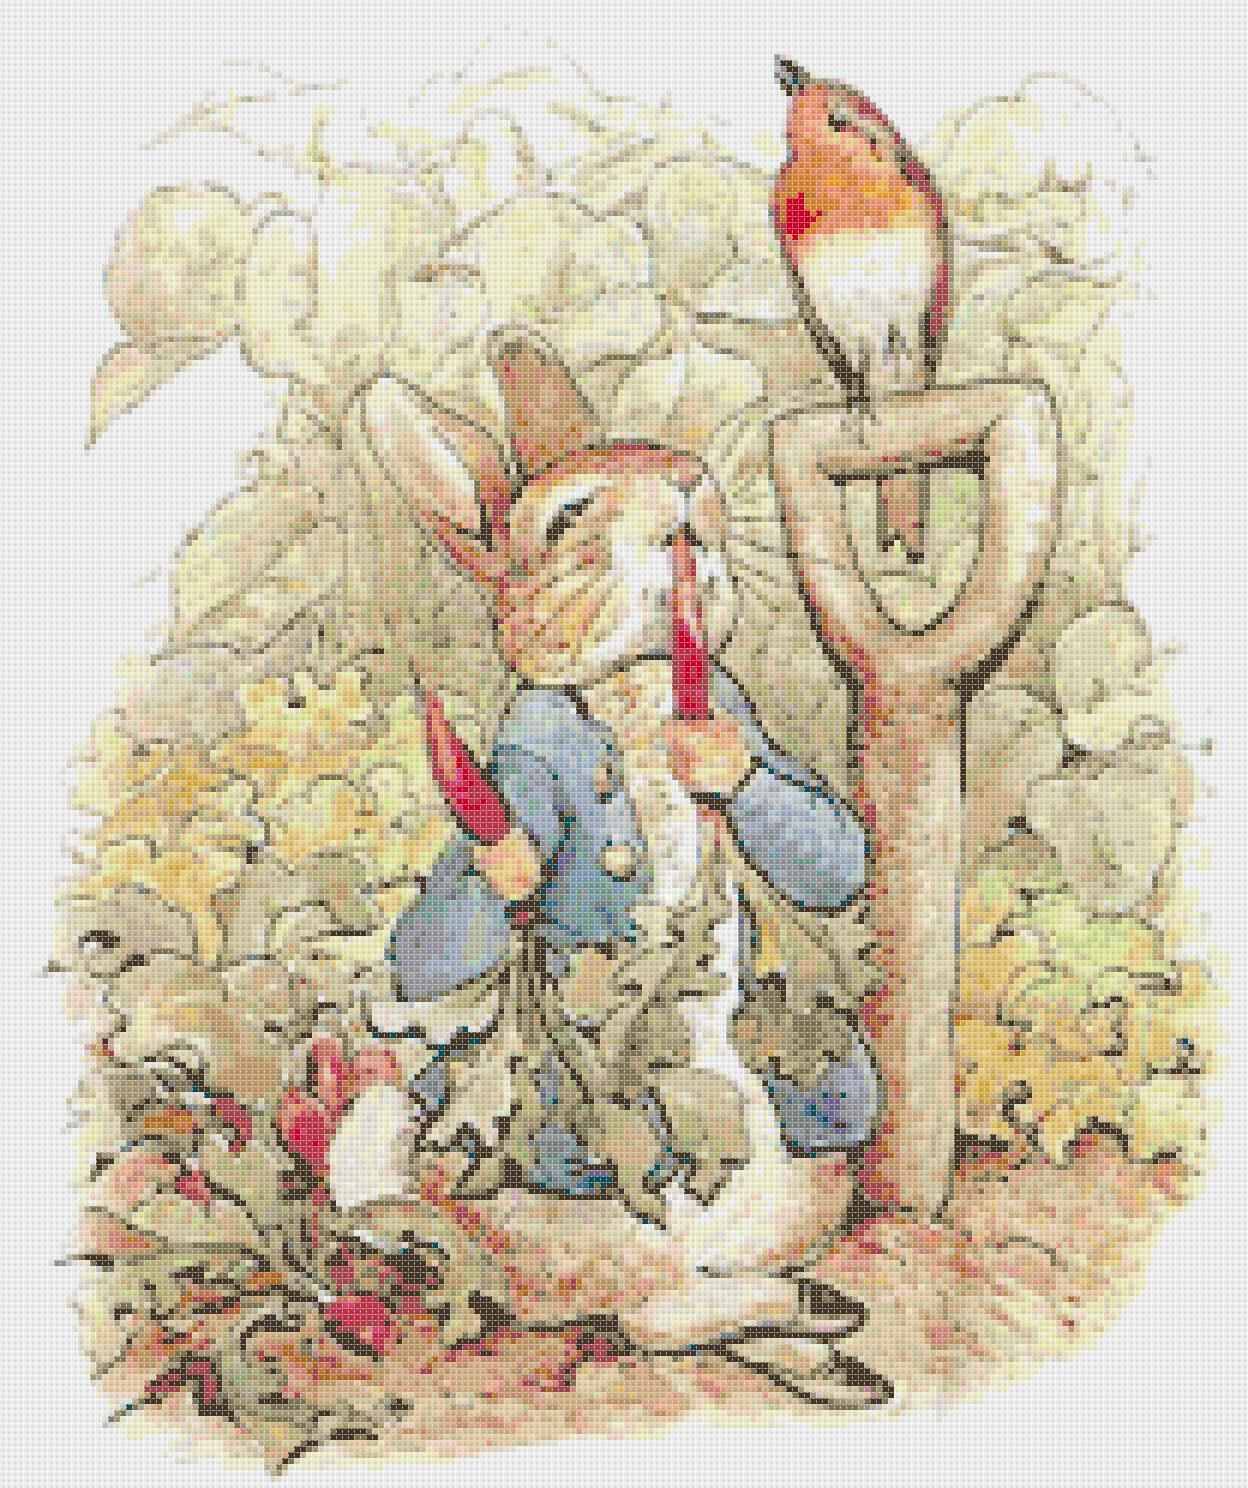 "Counted Cross Stitch  Rabbit by B. potter 14.86"" x 17.71"" - L1142 - $3.99"